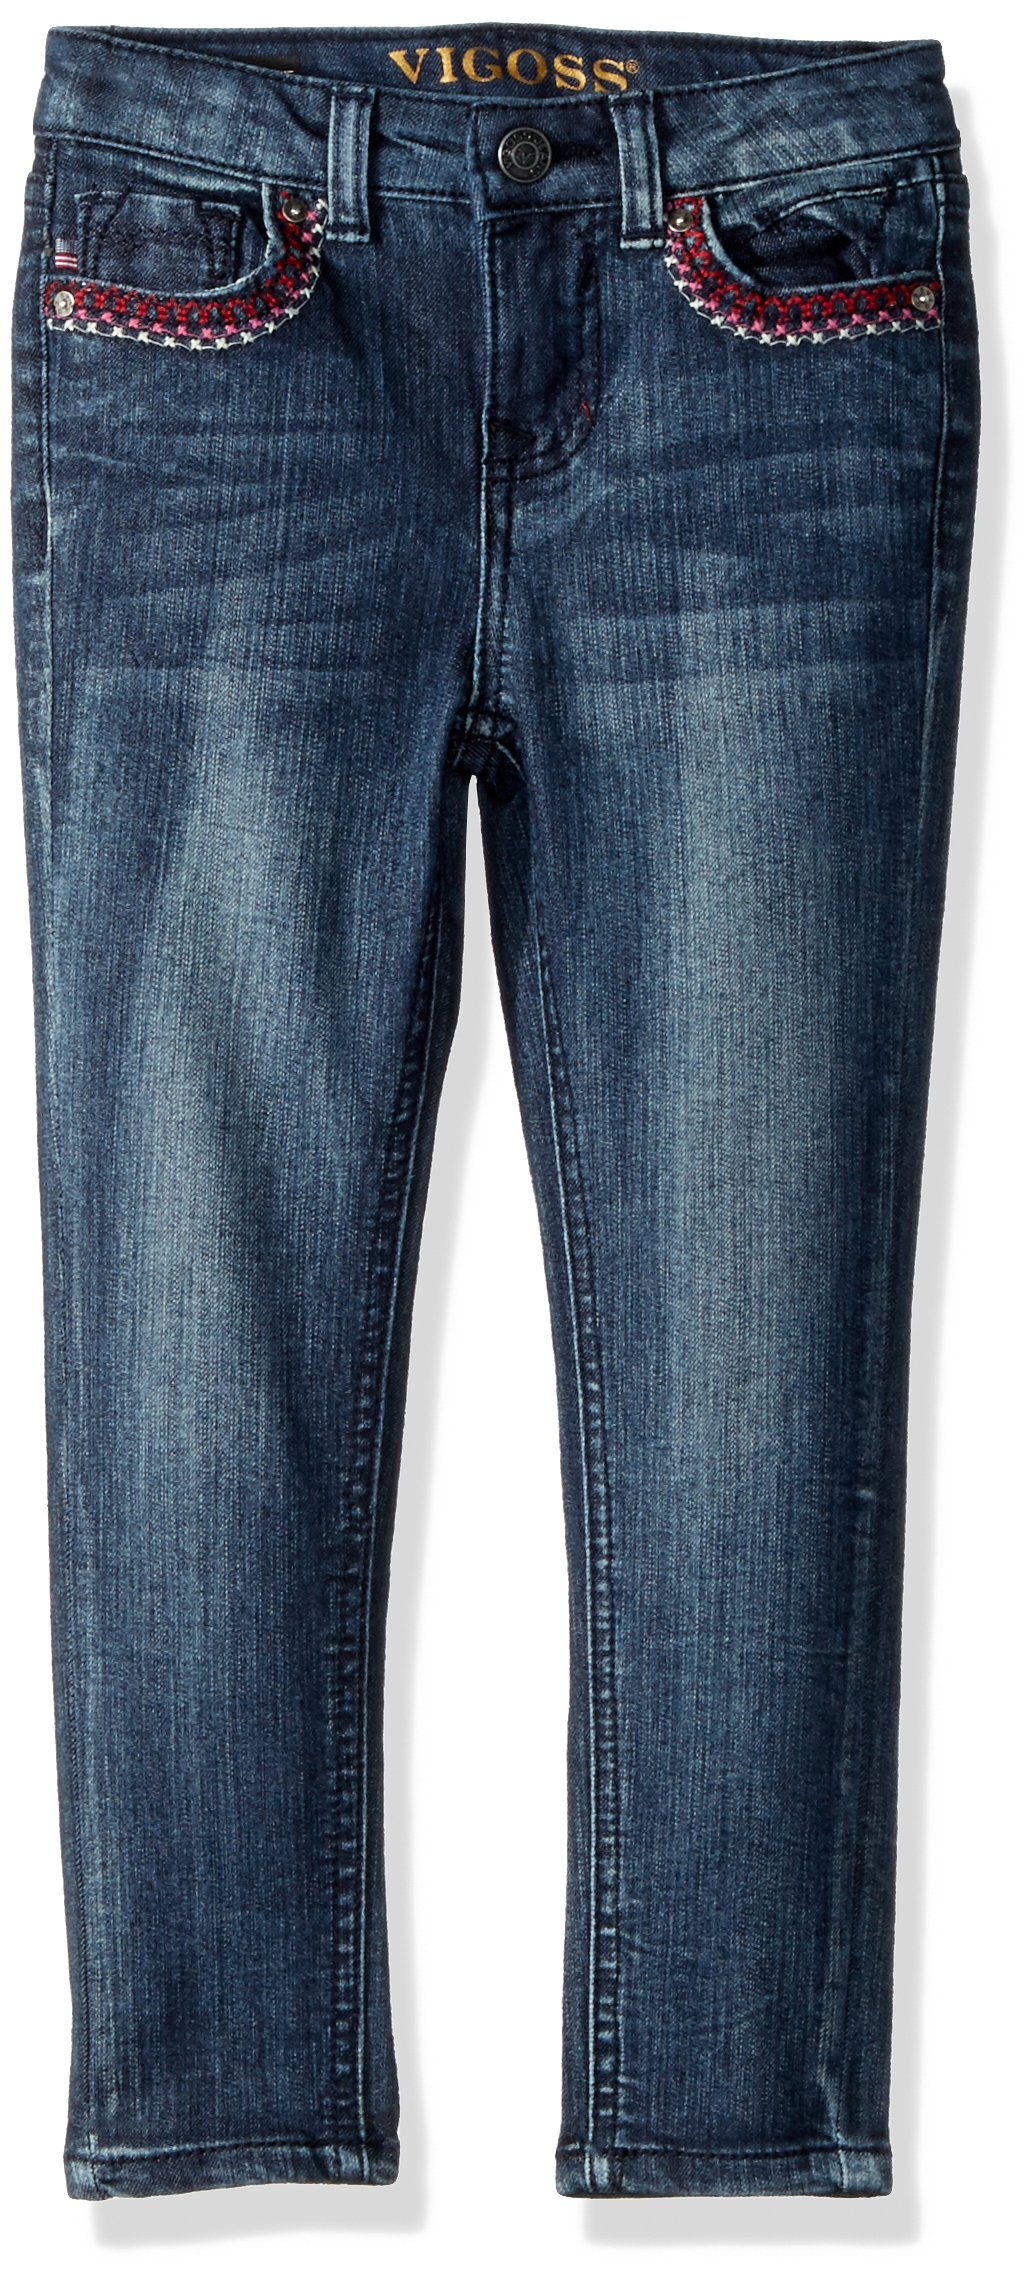 VIGOSS Girls' Big Back Pocket Jean, Memphis-439, 8